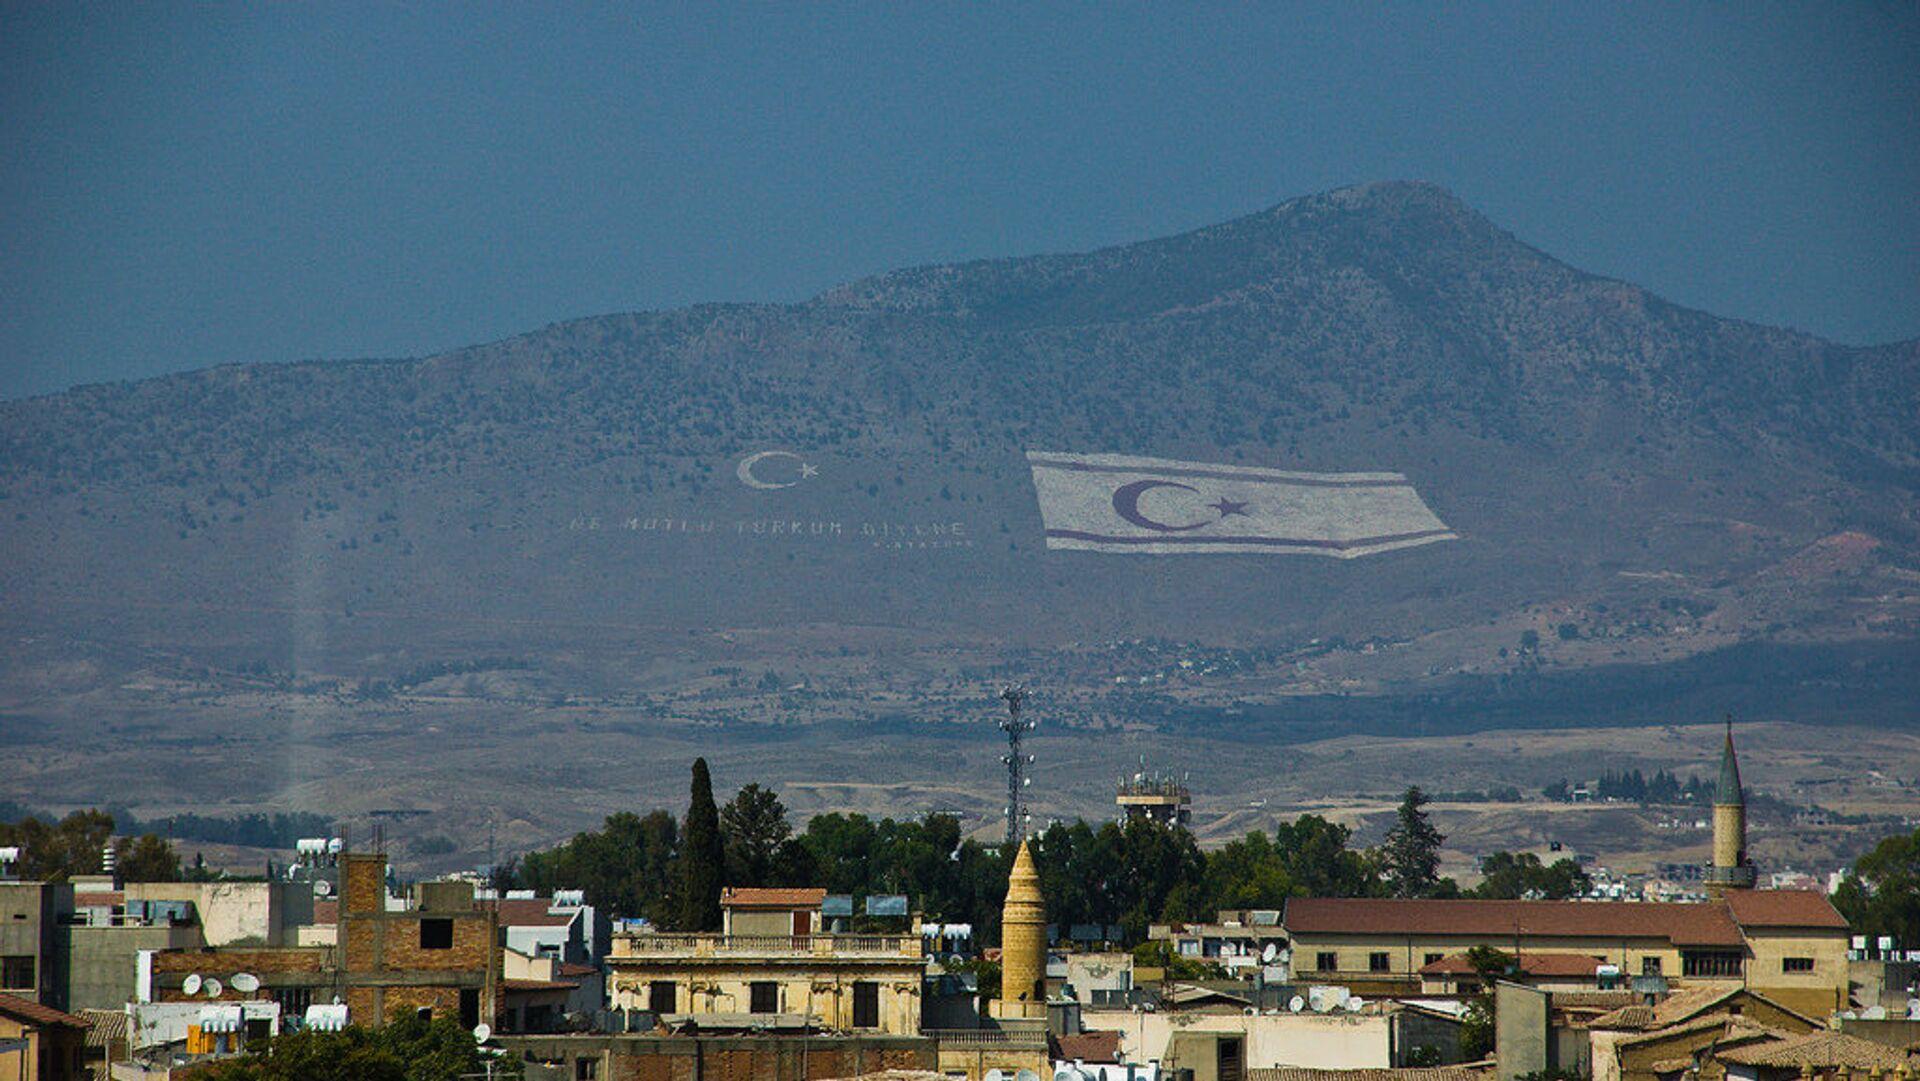 Flag of the self-declared Turkish Republic of Northern Cyprus in the hills above Cyprus' capital Nicosia. - Sputnik Italia, 1920, 22.07.2021